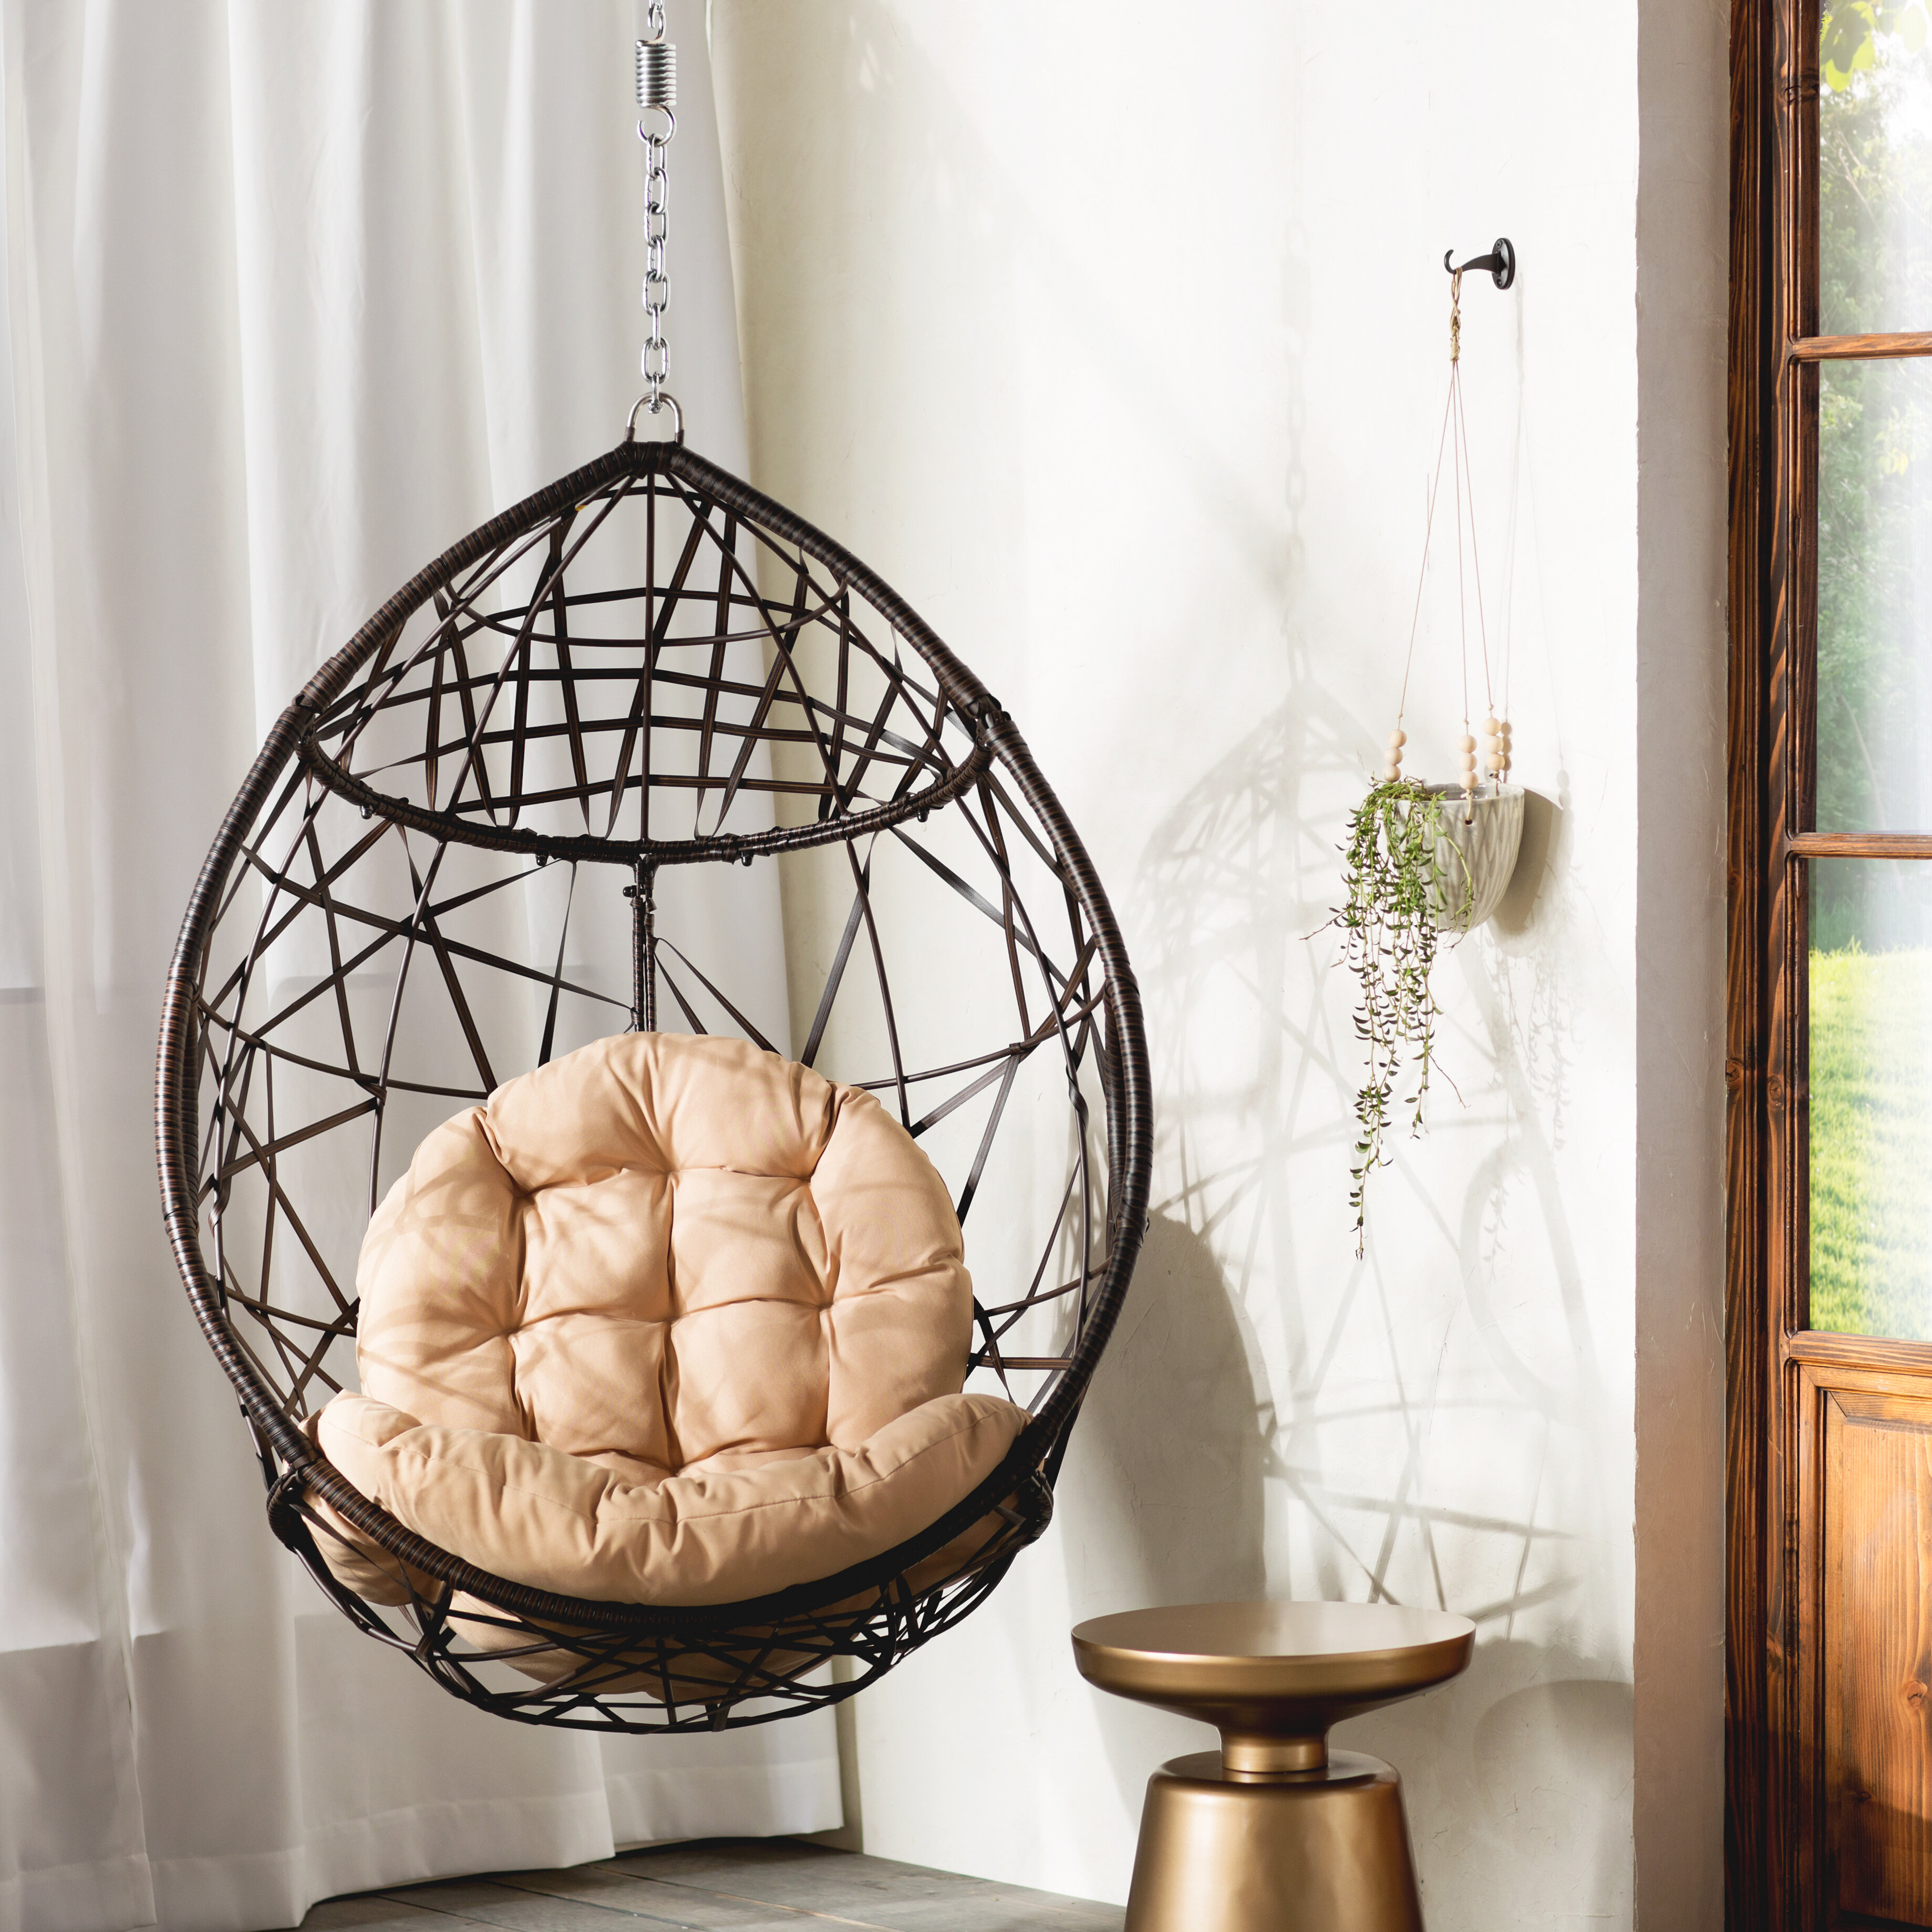 decorating pattern detail and modern allmodern altra owl home office shabby chair hammocks swing hammock chic with table ideas set blue haammss decor sonoma fabric ottoman kids